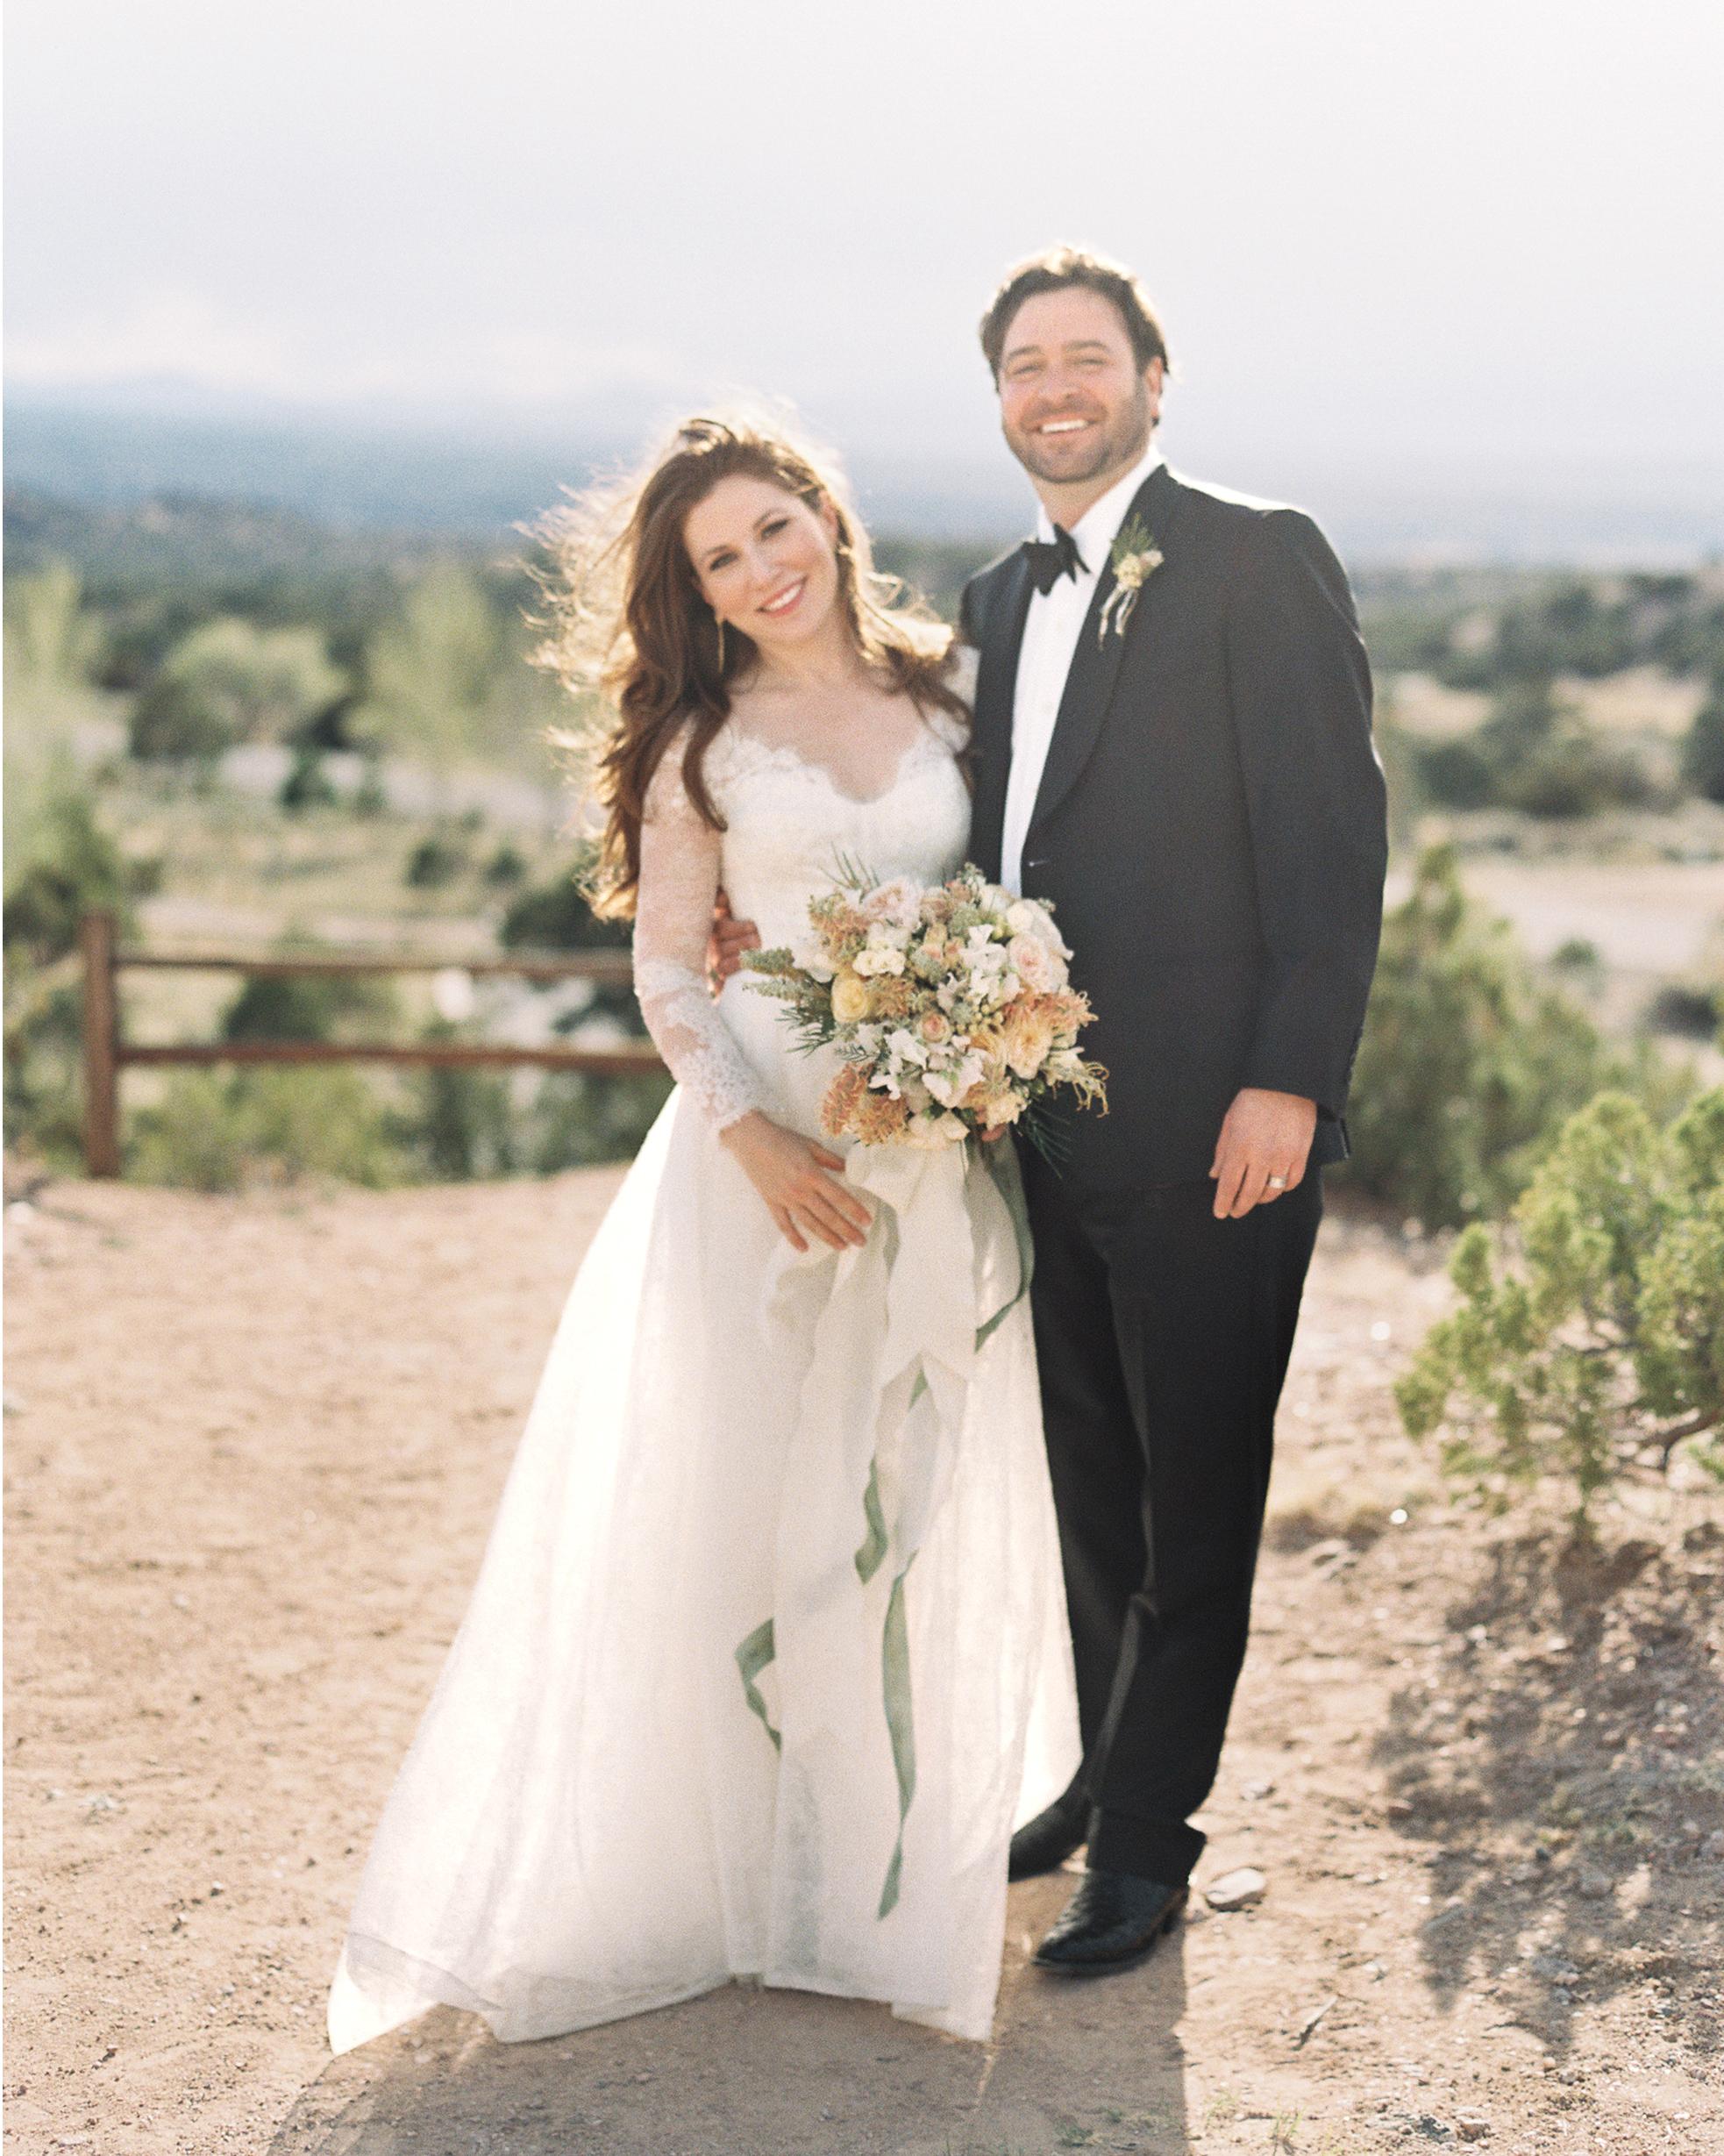 katherine-jared-wedding-0755-ds111387.jpg